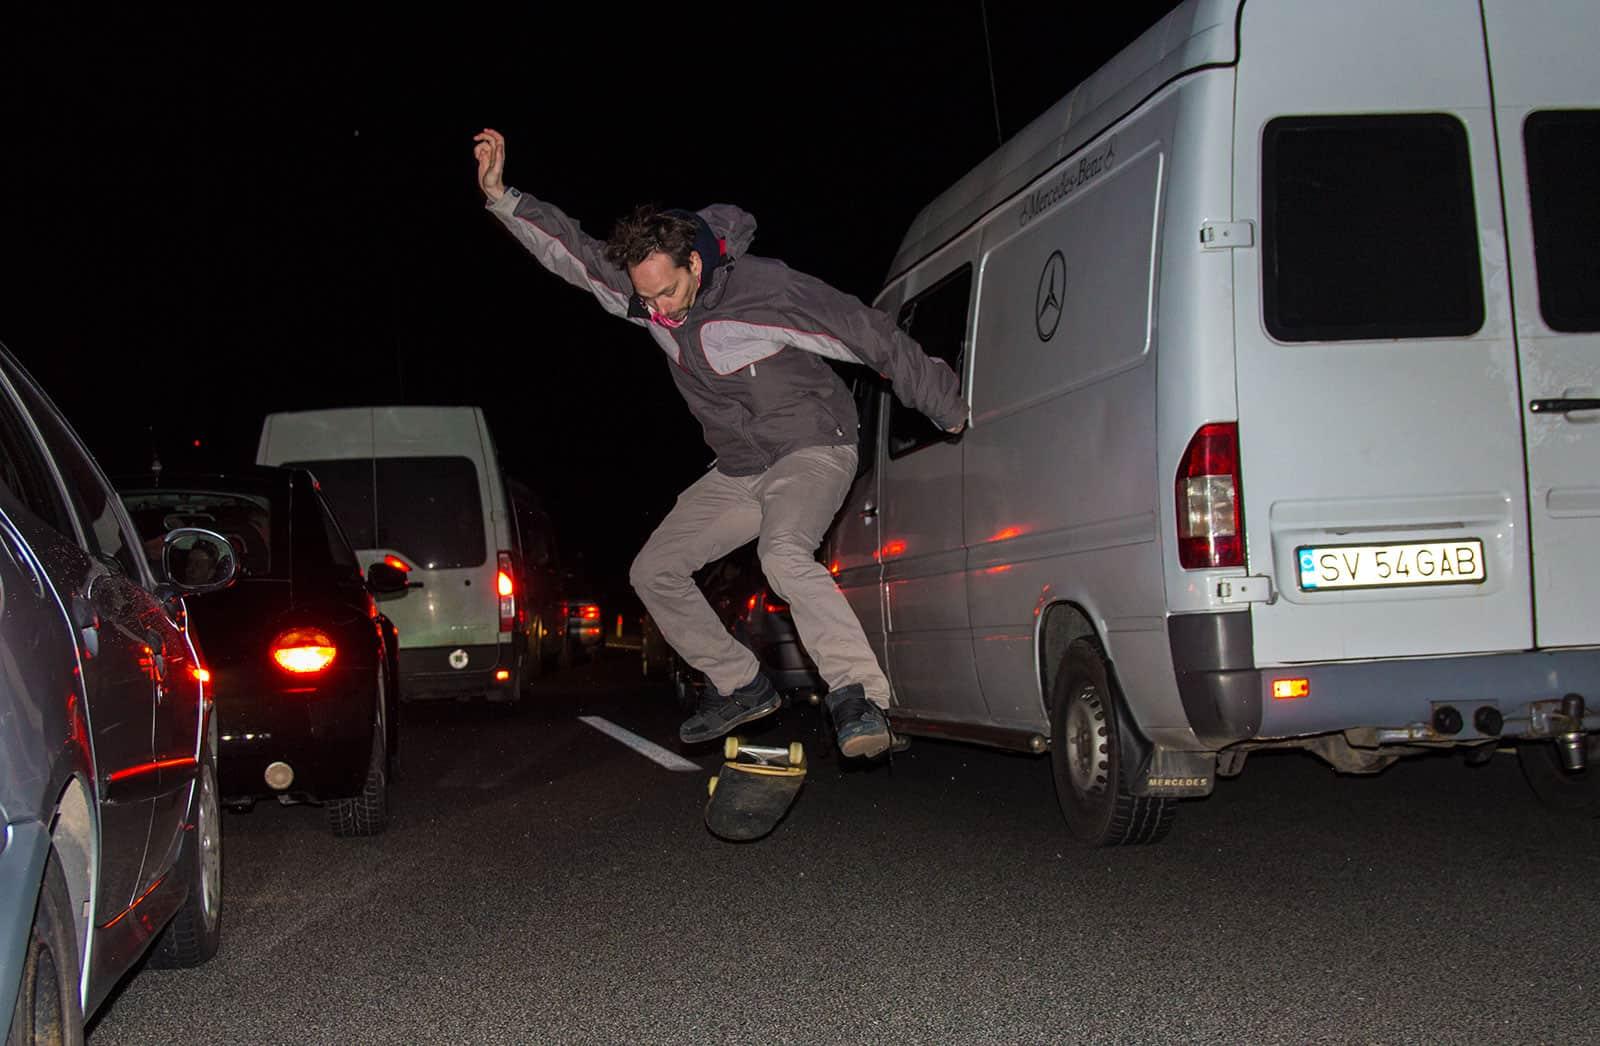 Highway skate.